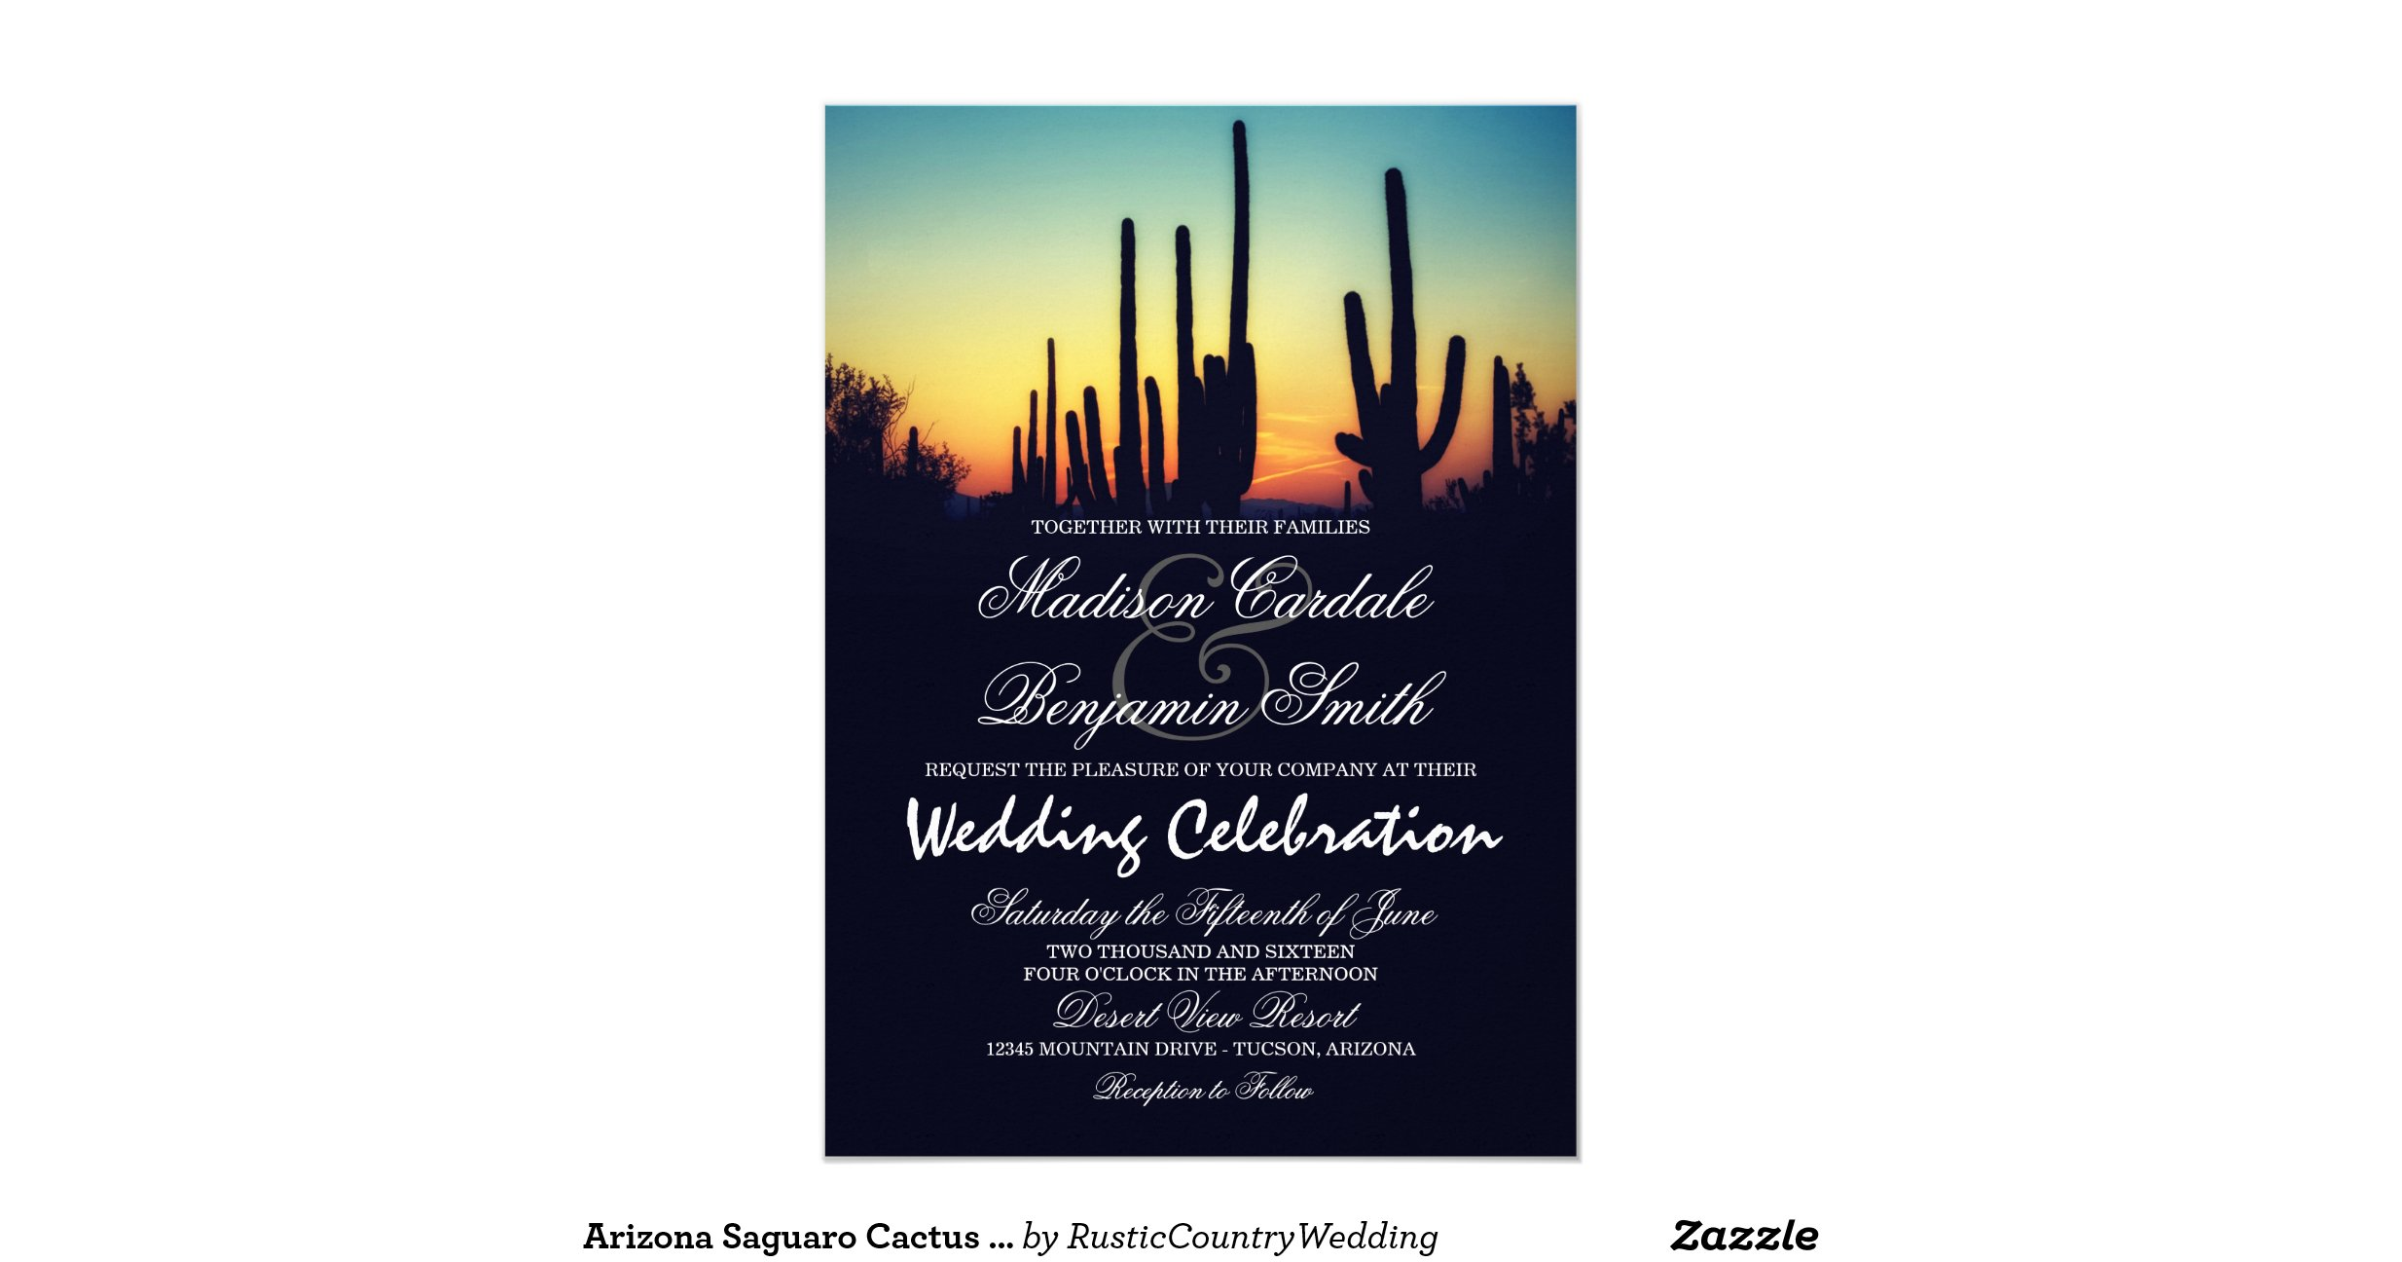 Wedding Invitations Az: Arizona_saguaro_cactus_sunset_wedding_invitations